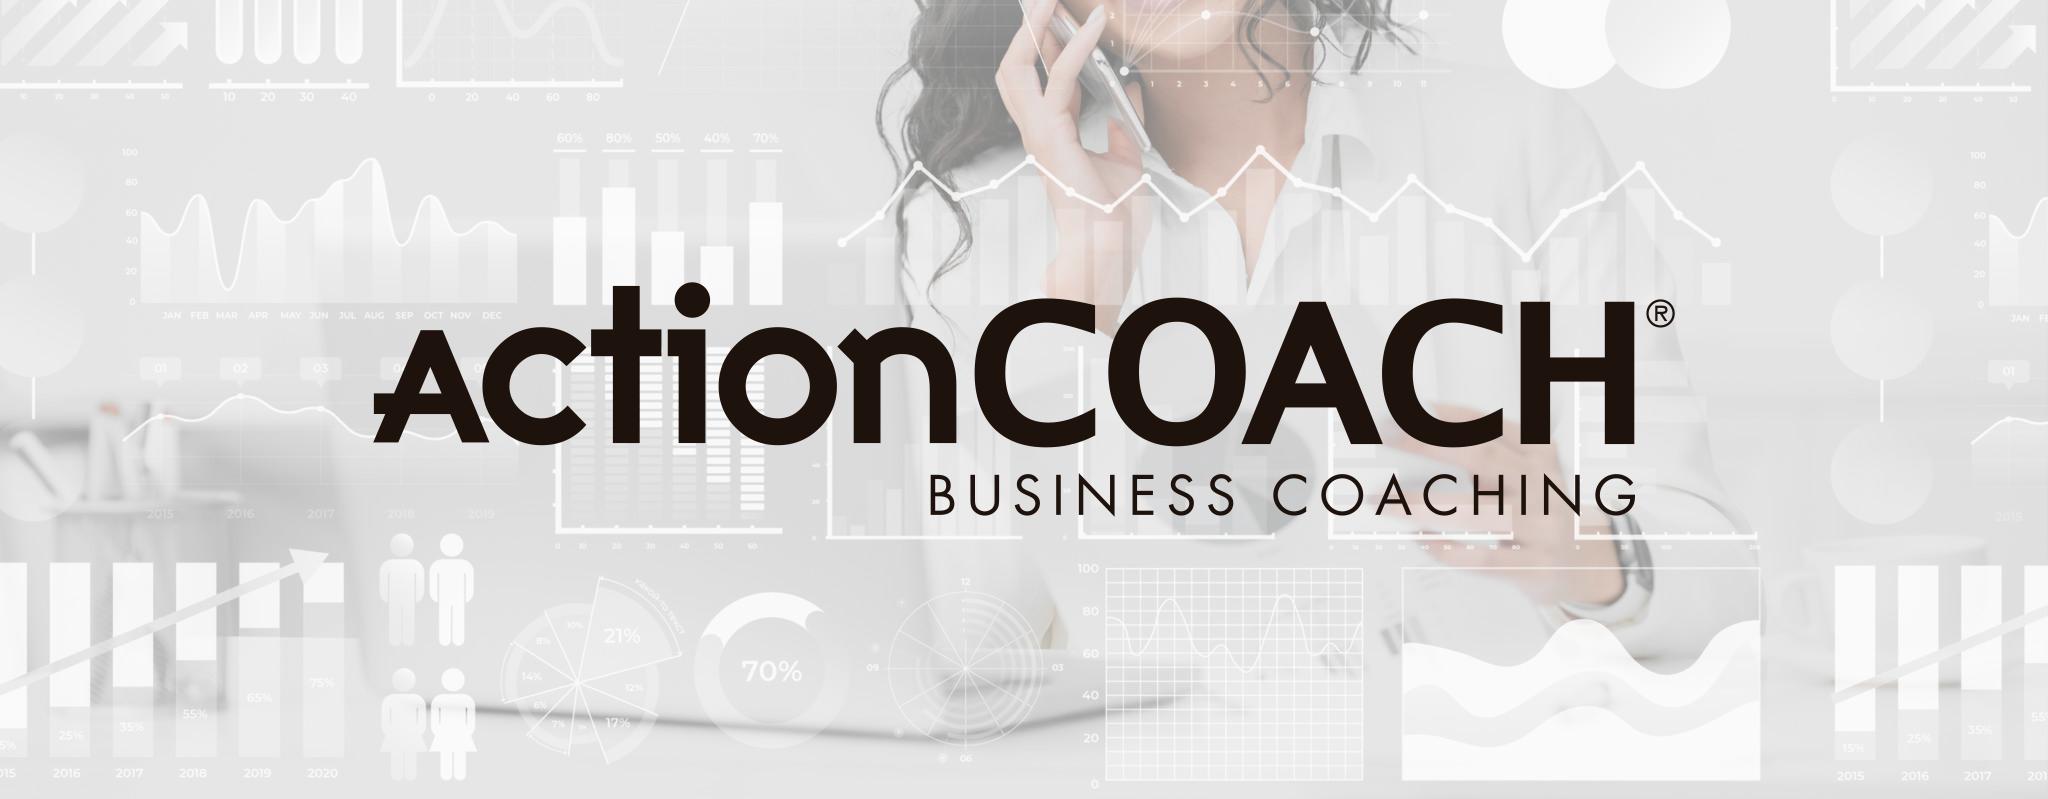 ActionCoach-0